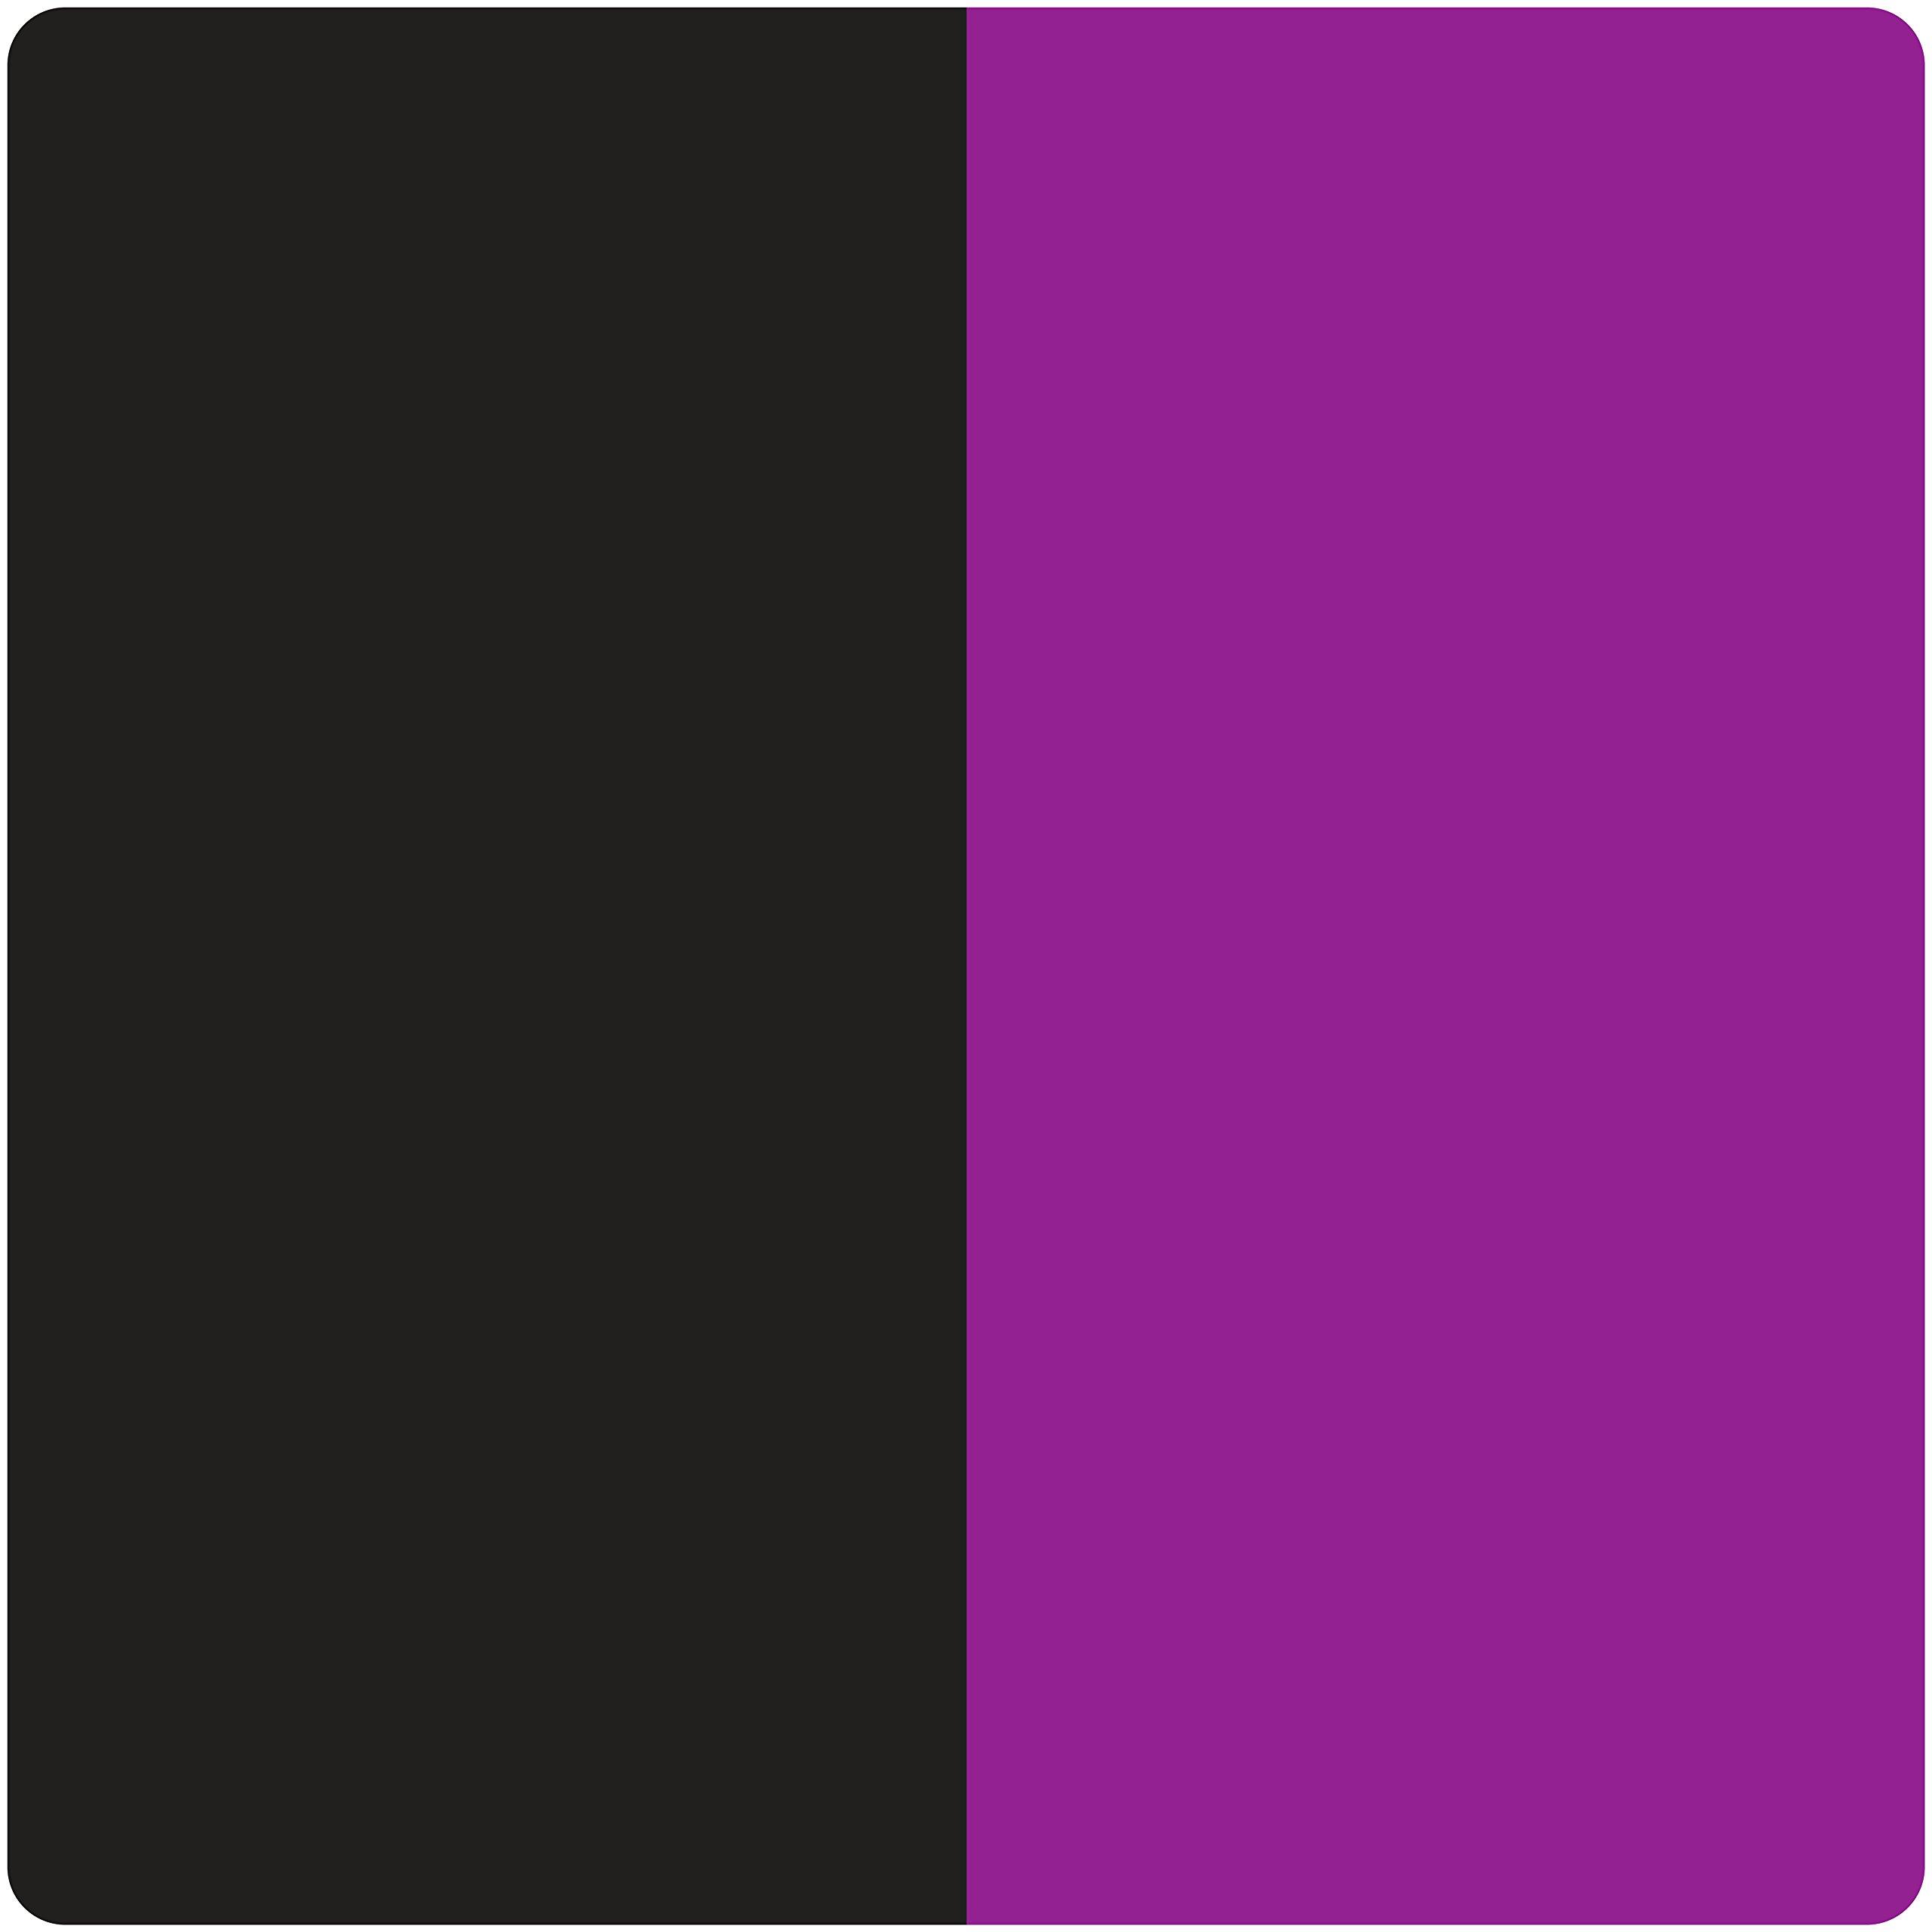 uni-ball 207 BLX Infusion Retractable Gel Pens, Medium Point (0.7mm), Purple/Black, 12 Count by Uni-ball (Image #2)